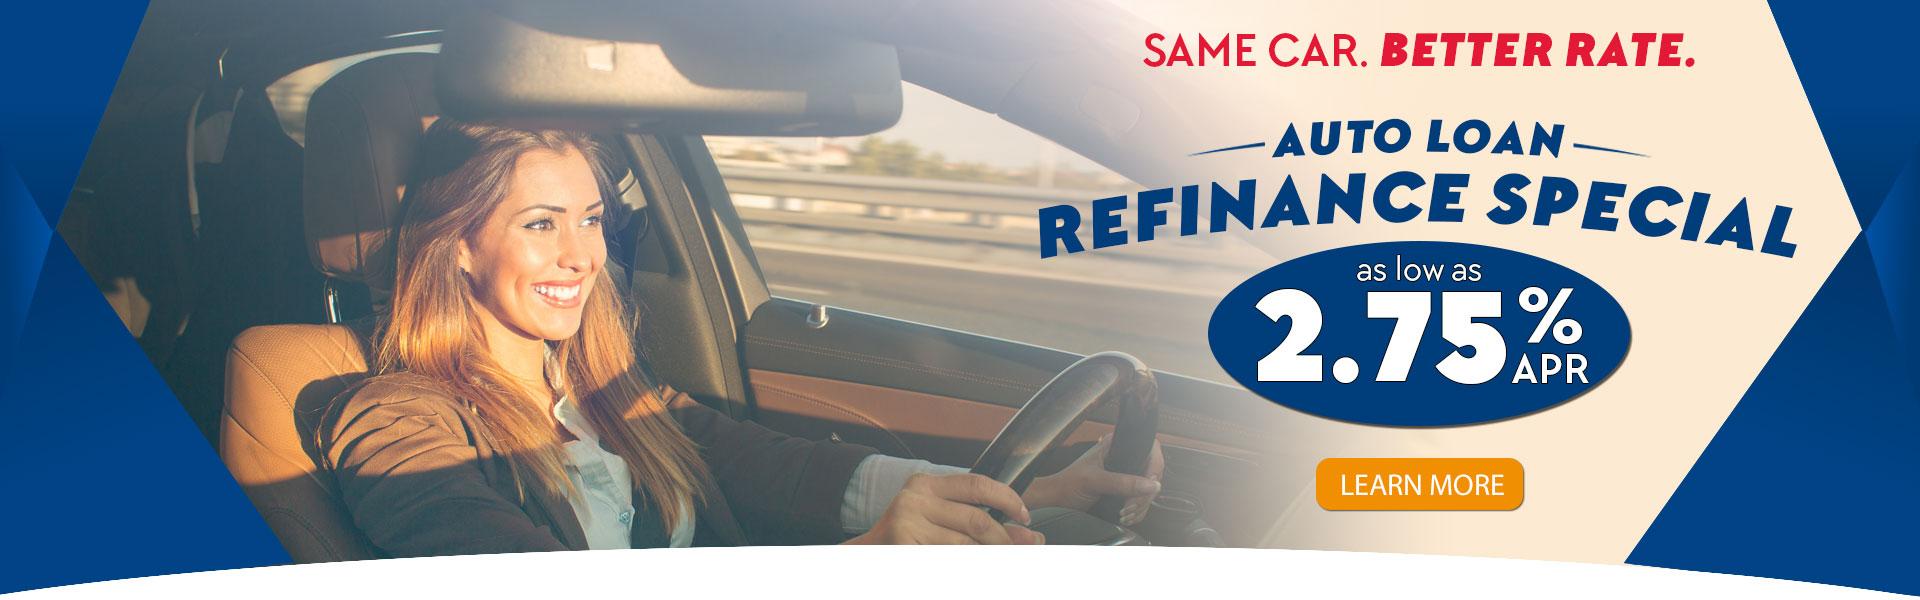 2.75% APR Auto Loan Refinance Special